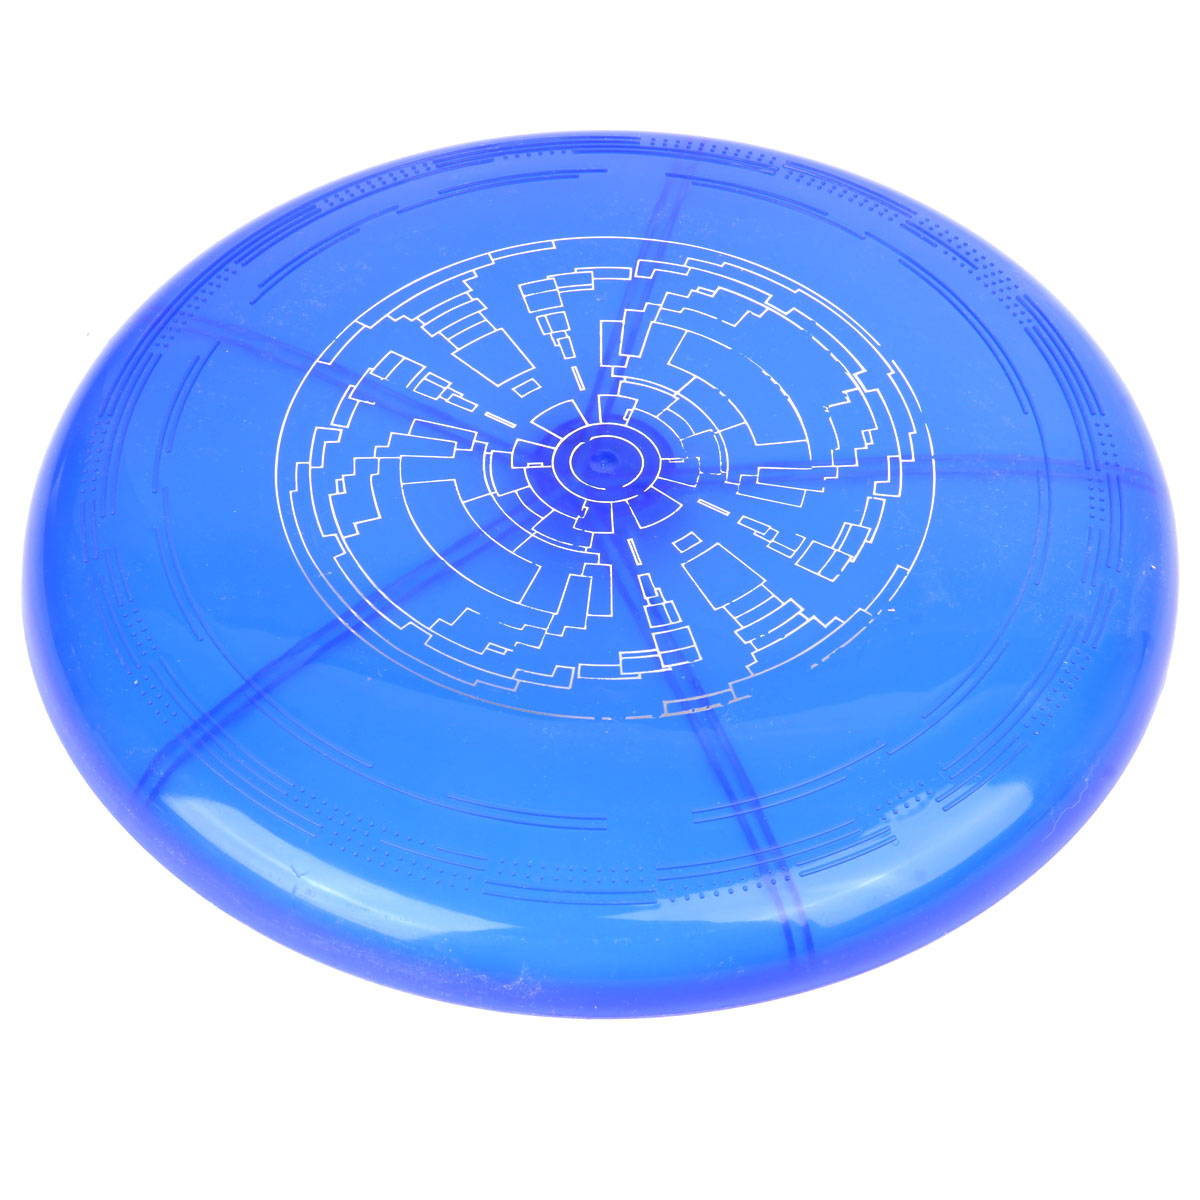 Летающая тарелка Veld Co. светящаяся